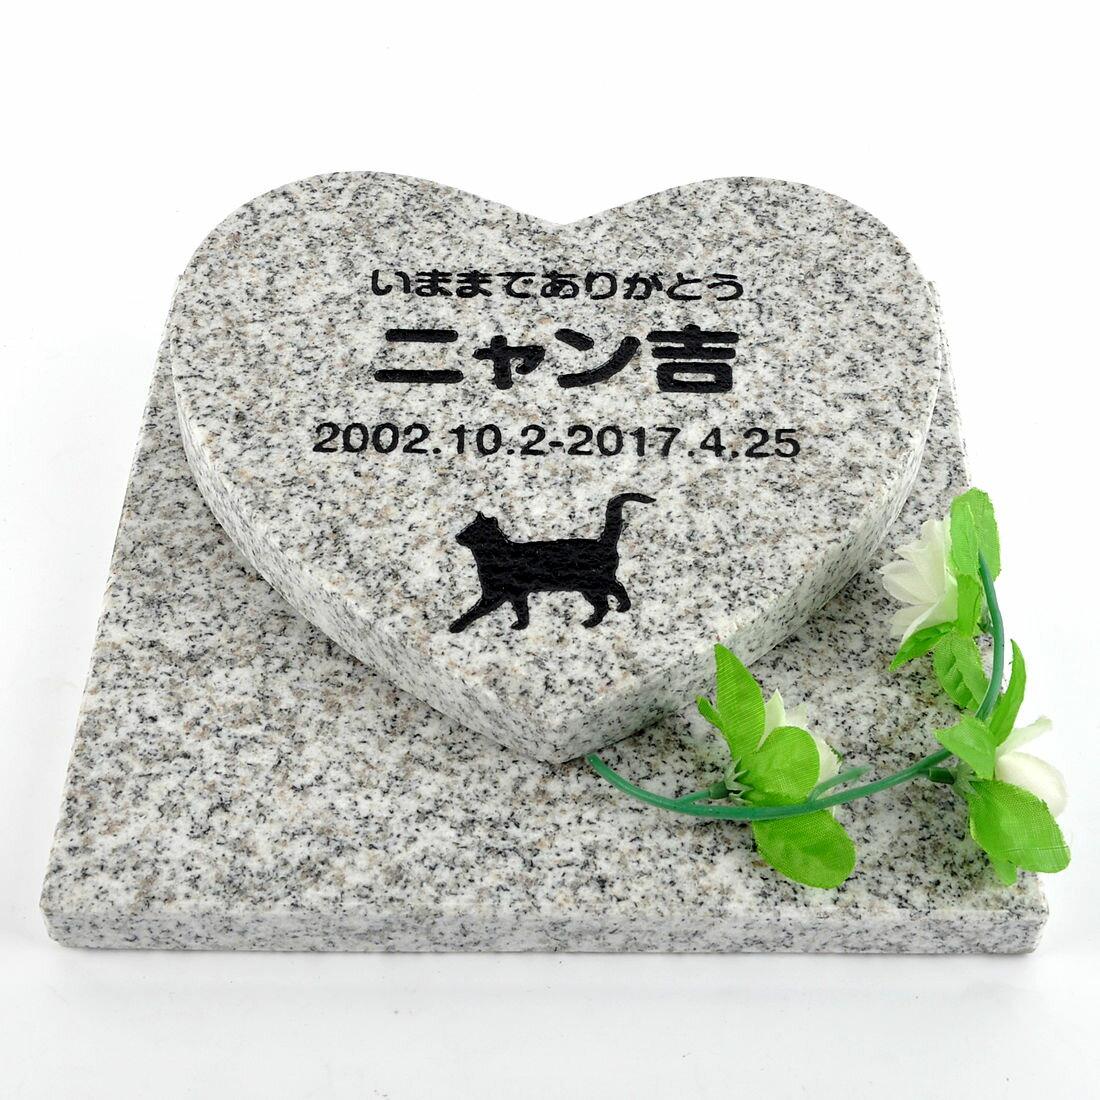 Pet&Love. ペットのお墓 天然石製 セット型 御影石 グレー ハート 【HLS_DU】【RCP】【】【_名入れ】 attr131attr ctgr2ctgr sml3sml CAT